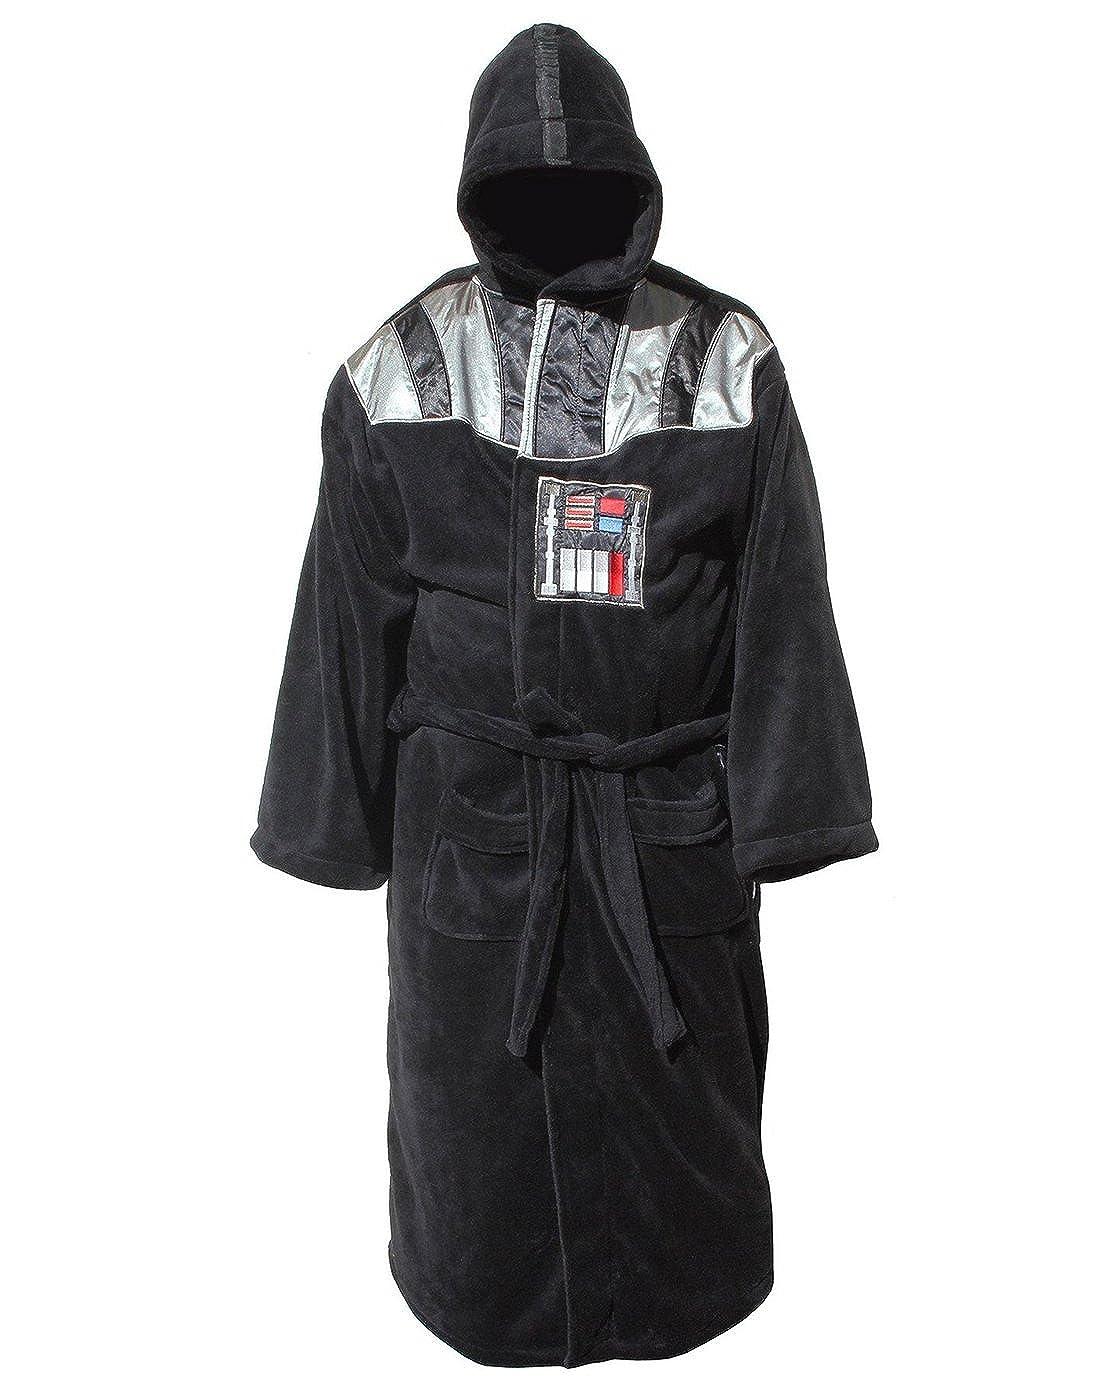 Star Wars Darth Vader Uniform Fleece Bathrobe Robe Factory